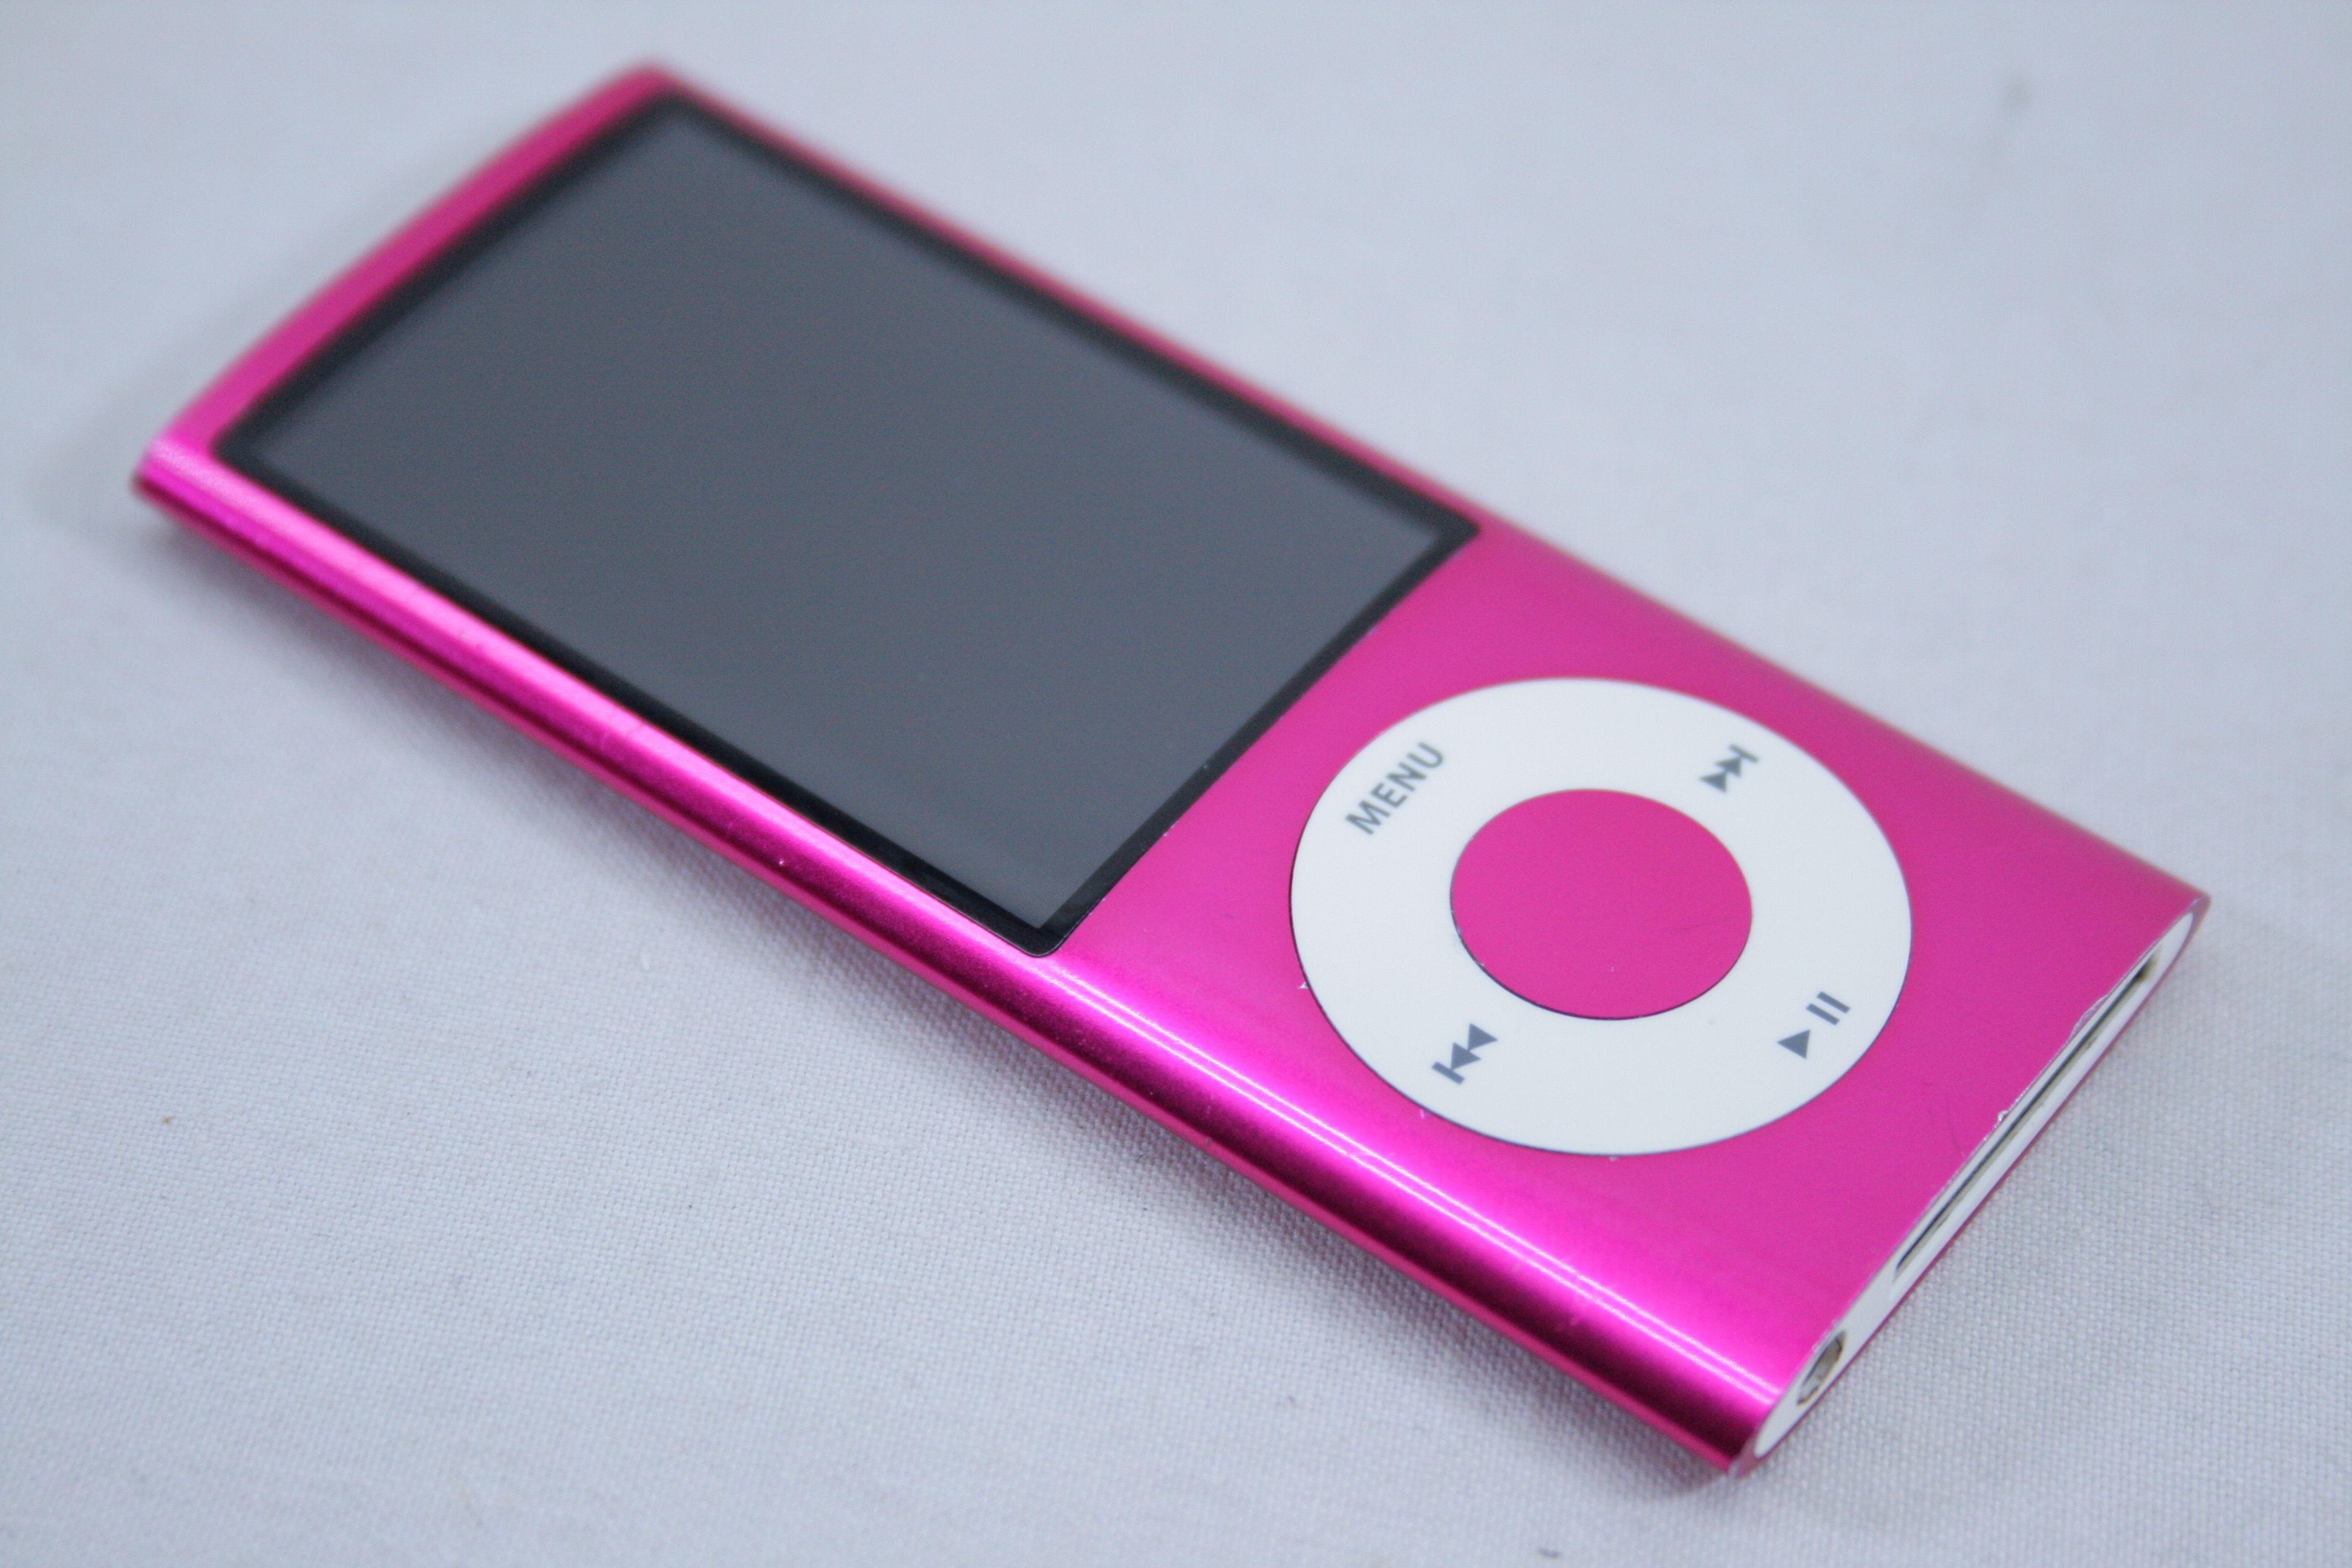 Apple iPod nano 5th Generation Pink (16GB) | eBay